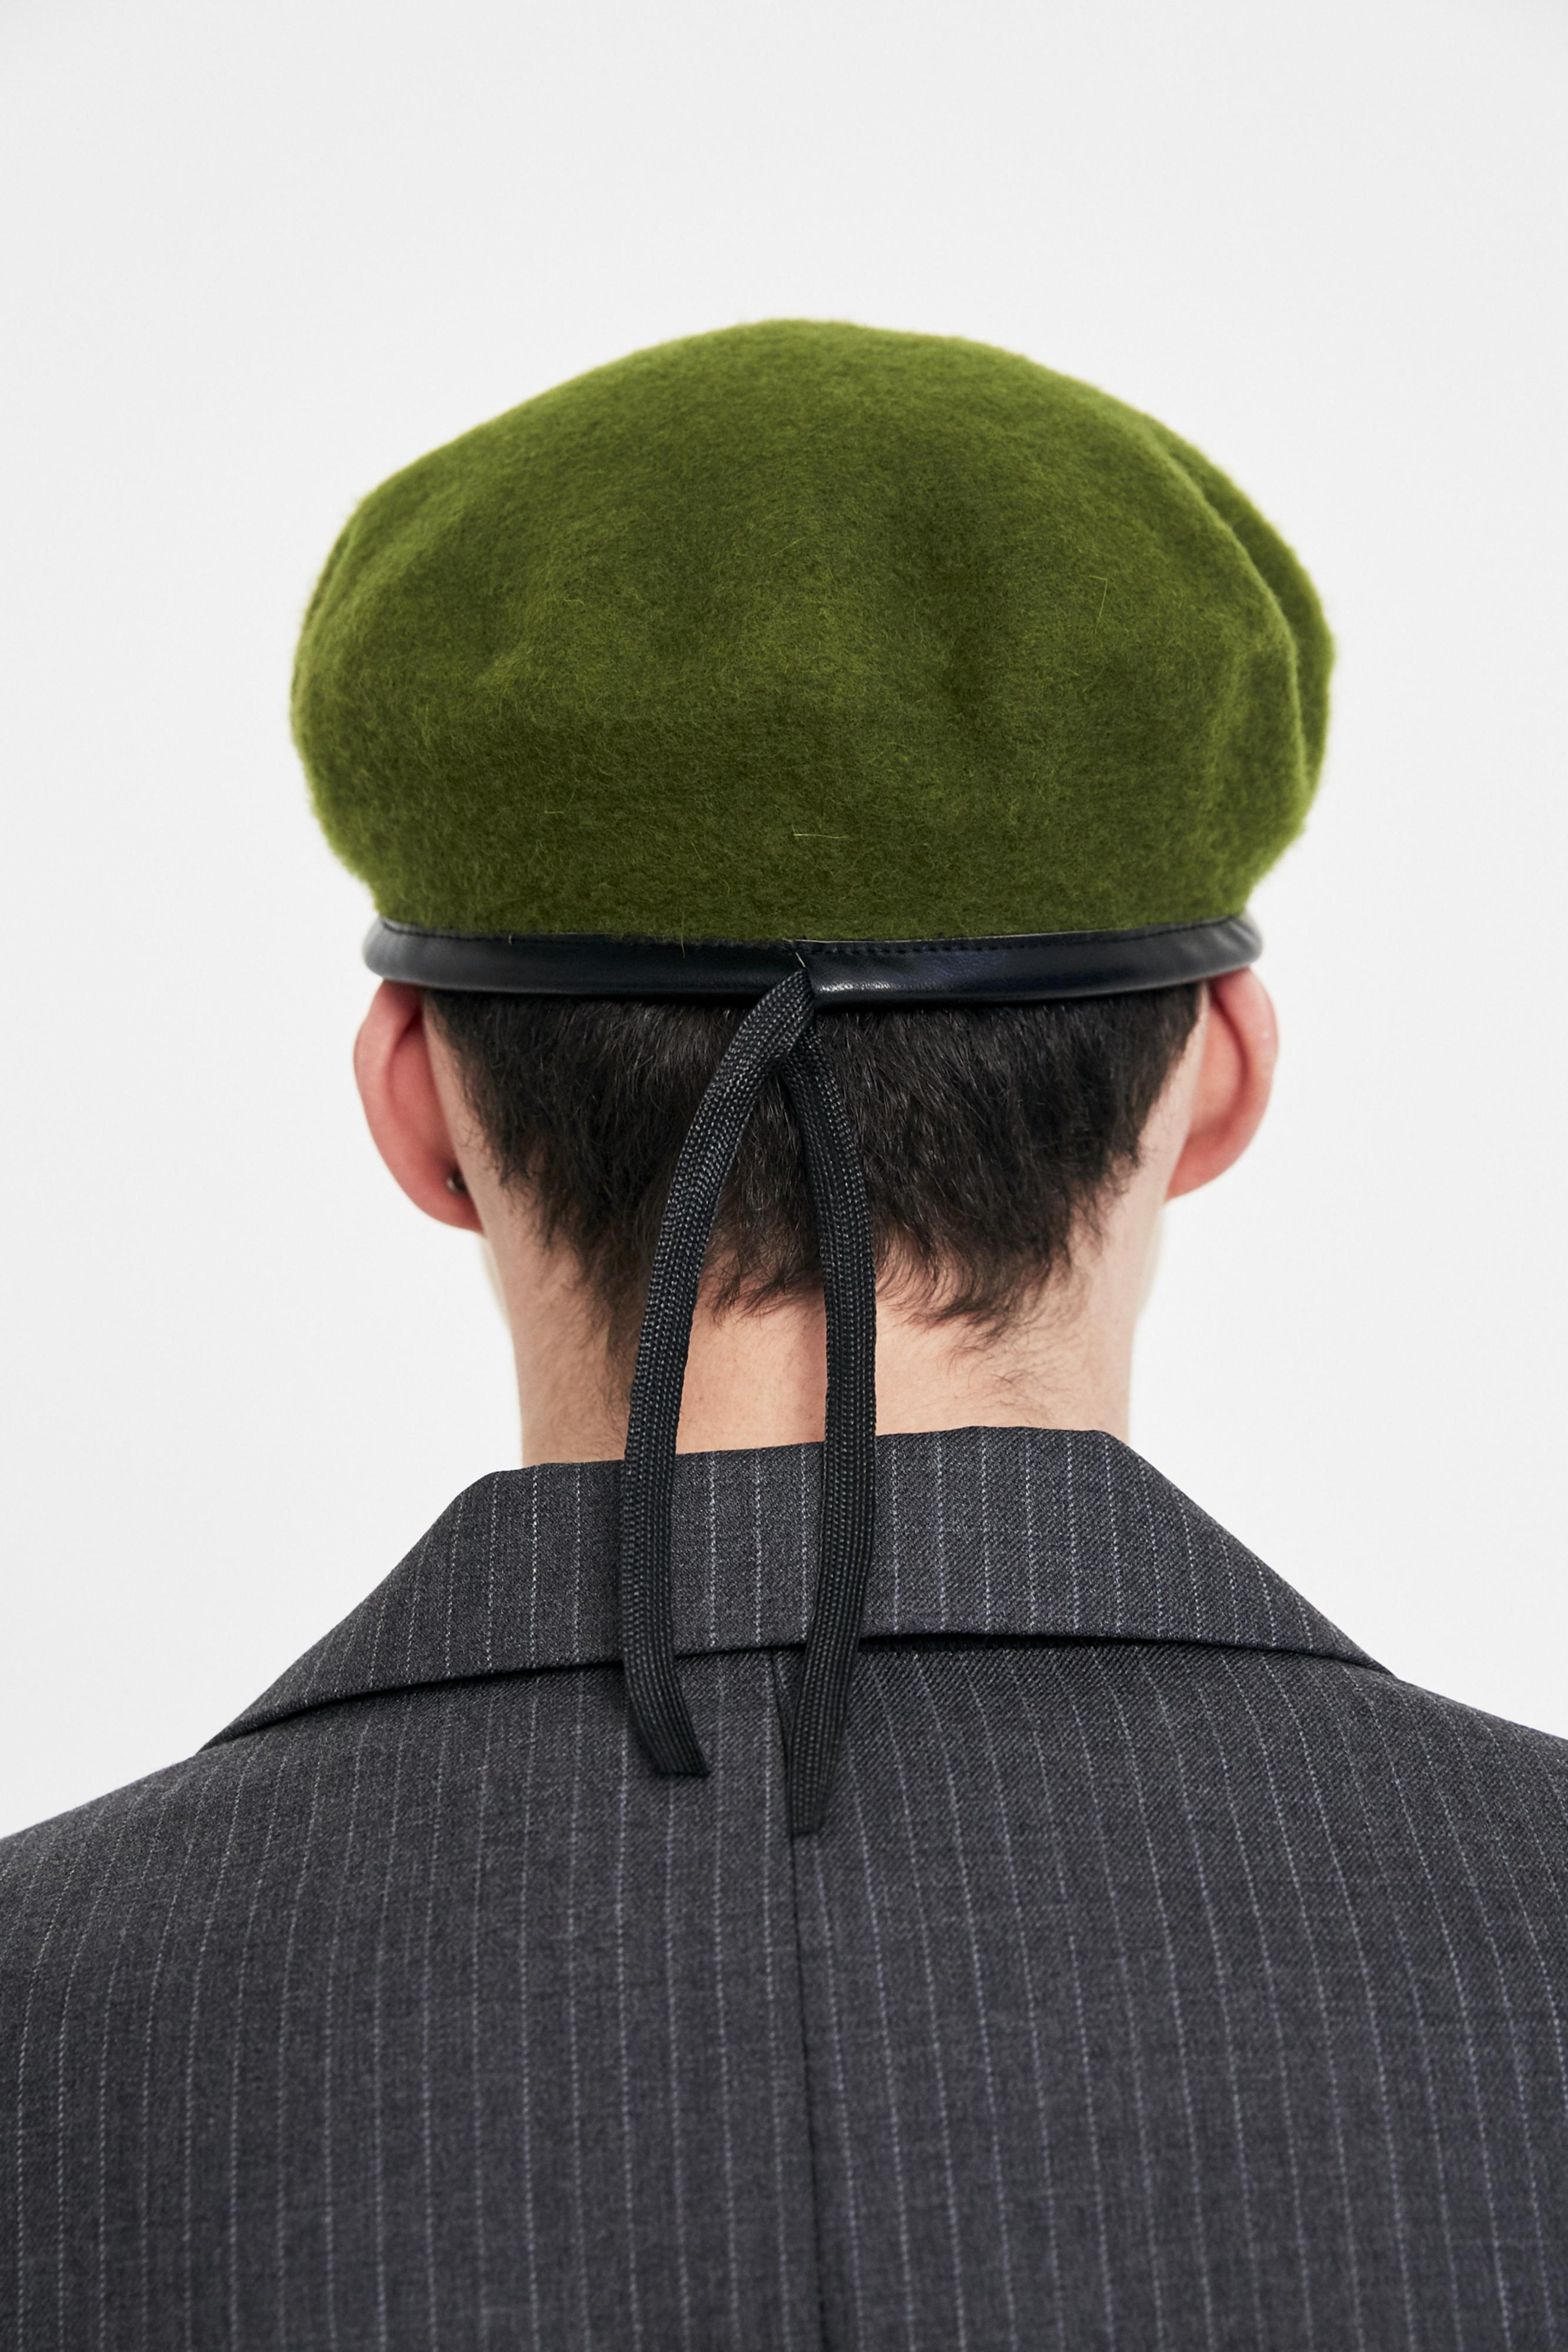 c20d6617f878f Gosha Rubchinskiy Green Military Beret in Green for Men - Lyst